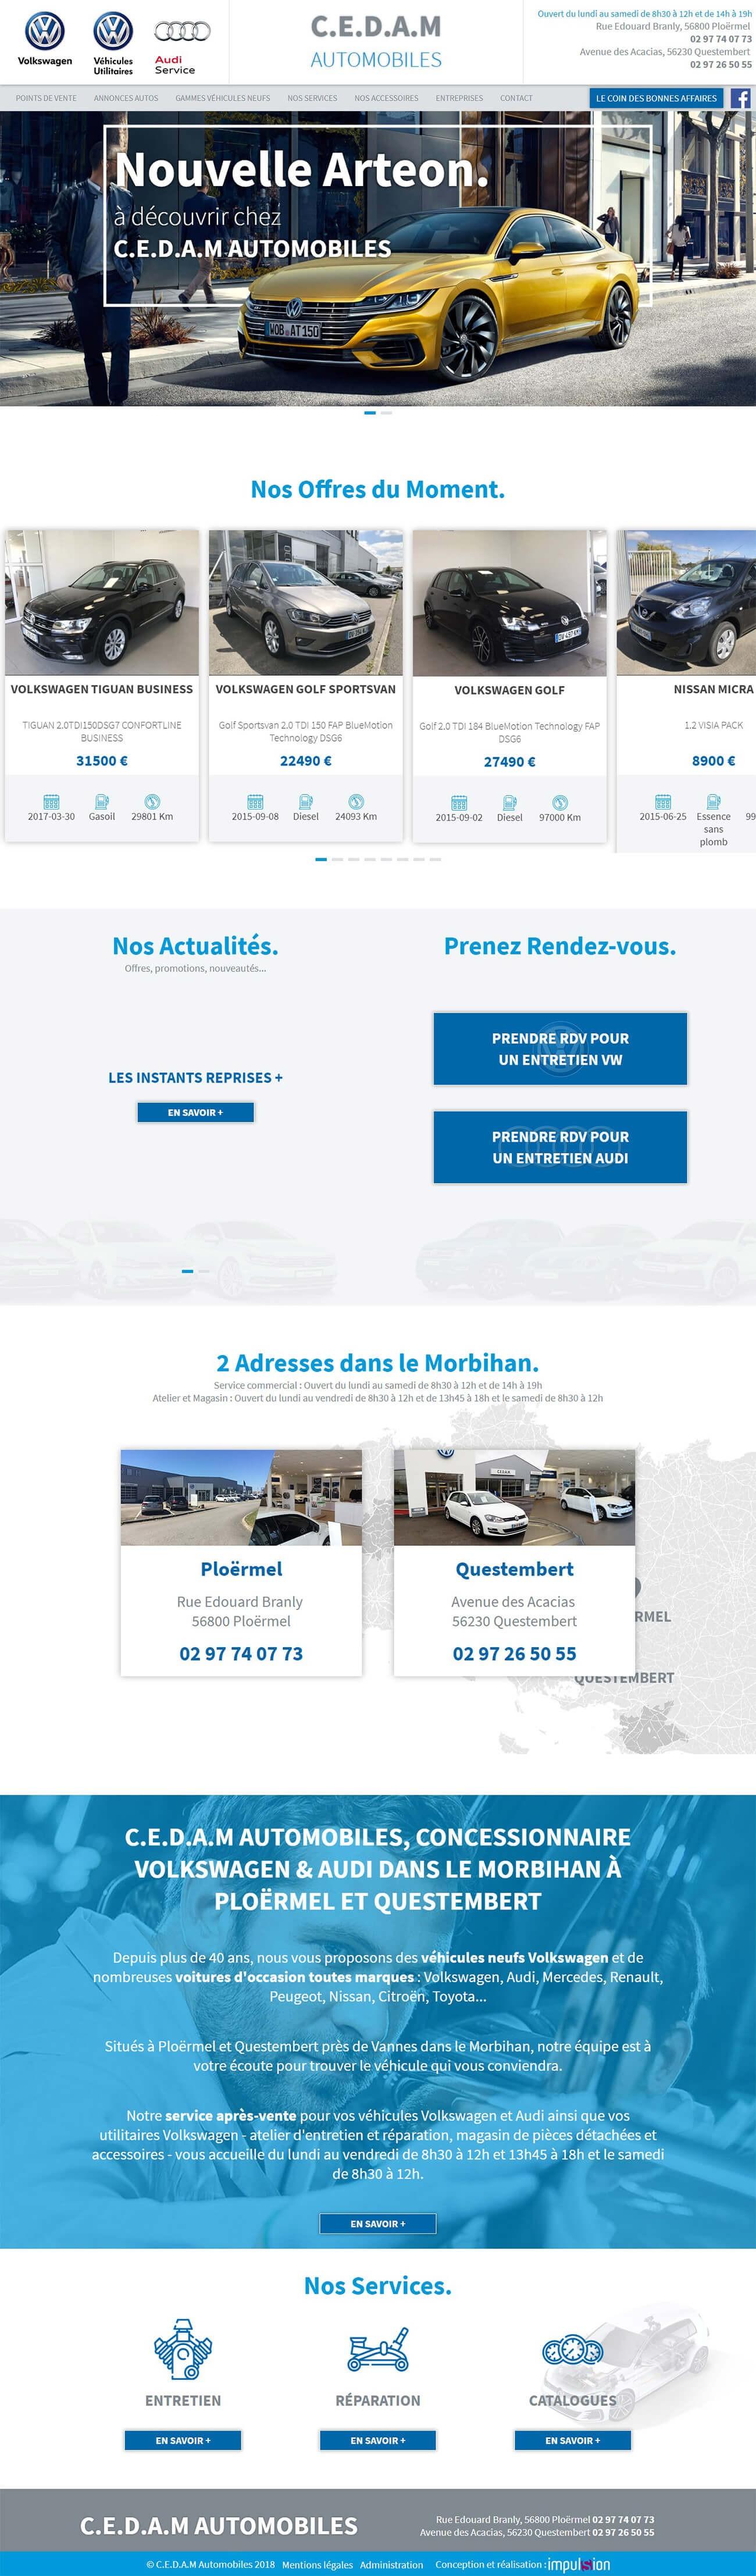 Cedam-Concessionnaire-Volkswagen-Audi-Ploermel-Questembert---Cedam.jpg